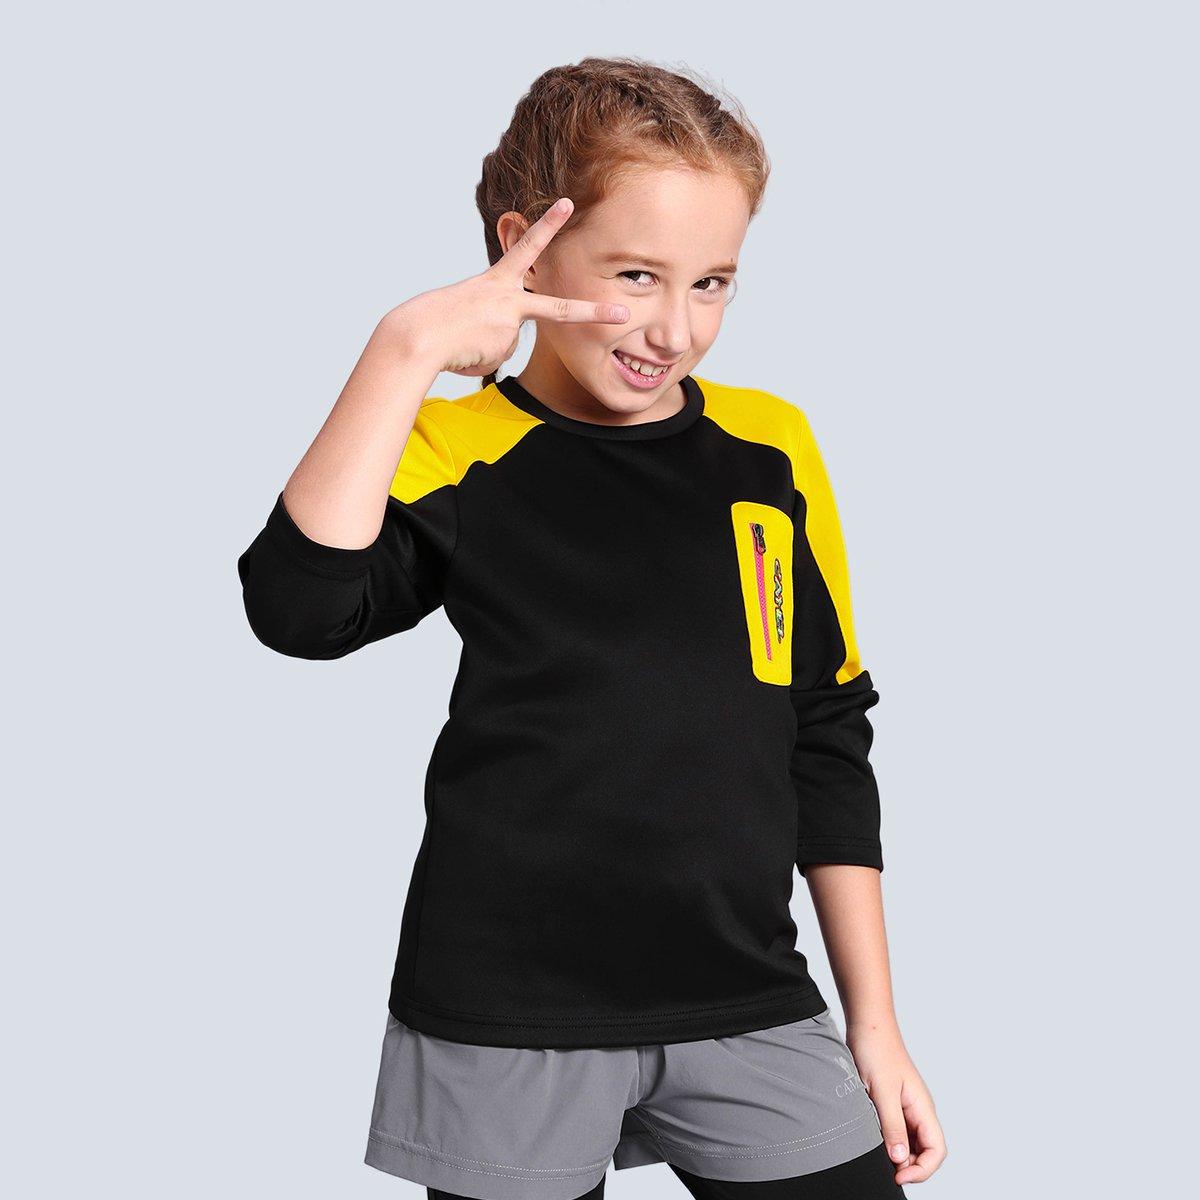 8021.�9.b9�#h�_骆驼小骆驼男女童休闲长t舒适透气双面布8021h821da6